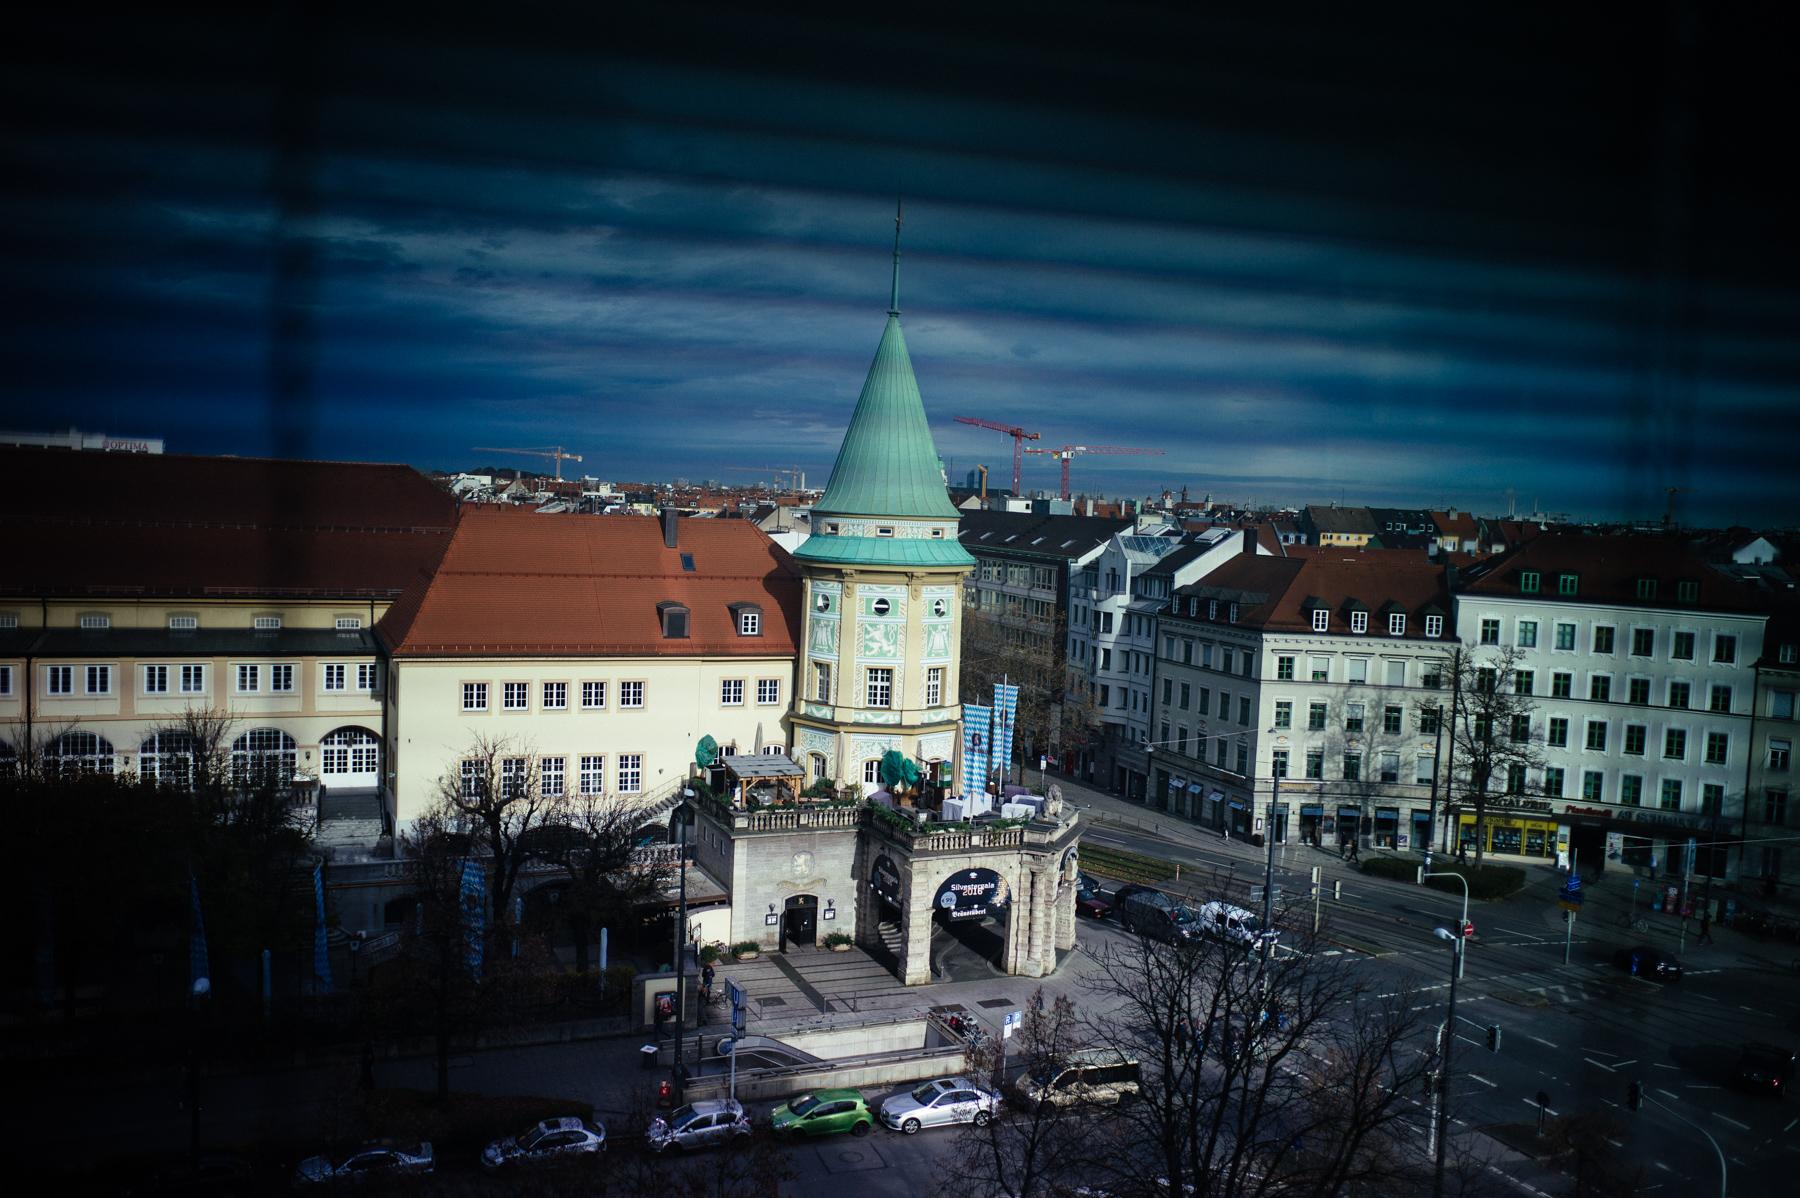 andre-duhme-fotograf-mu%cc%88nchenl1010890